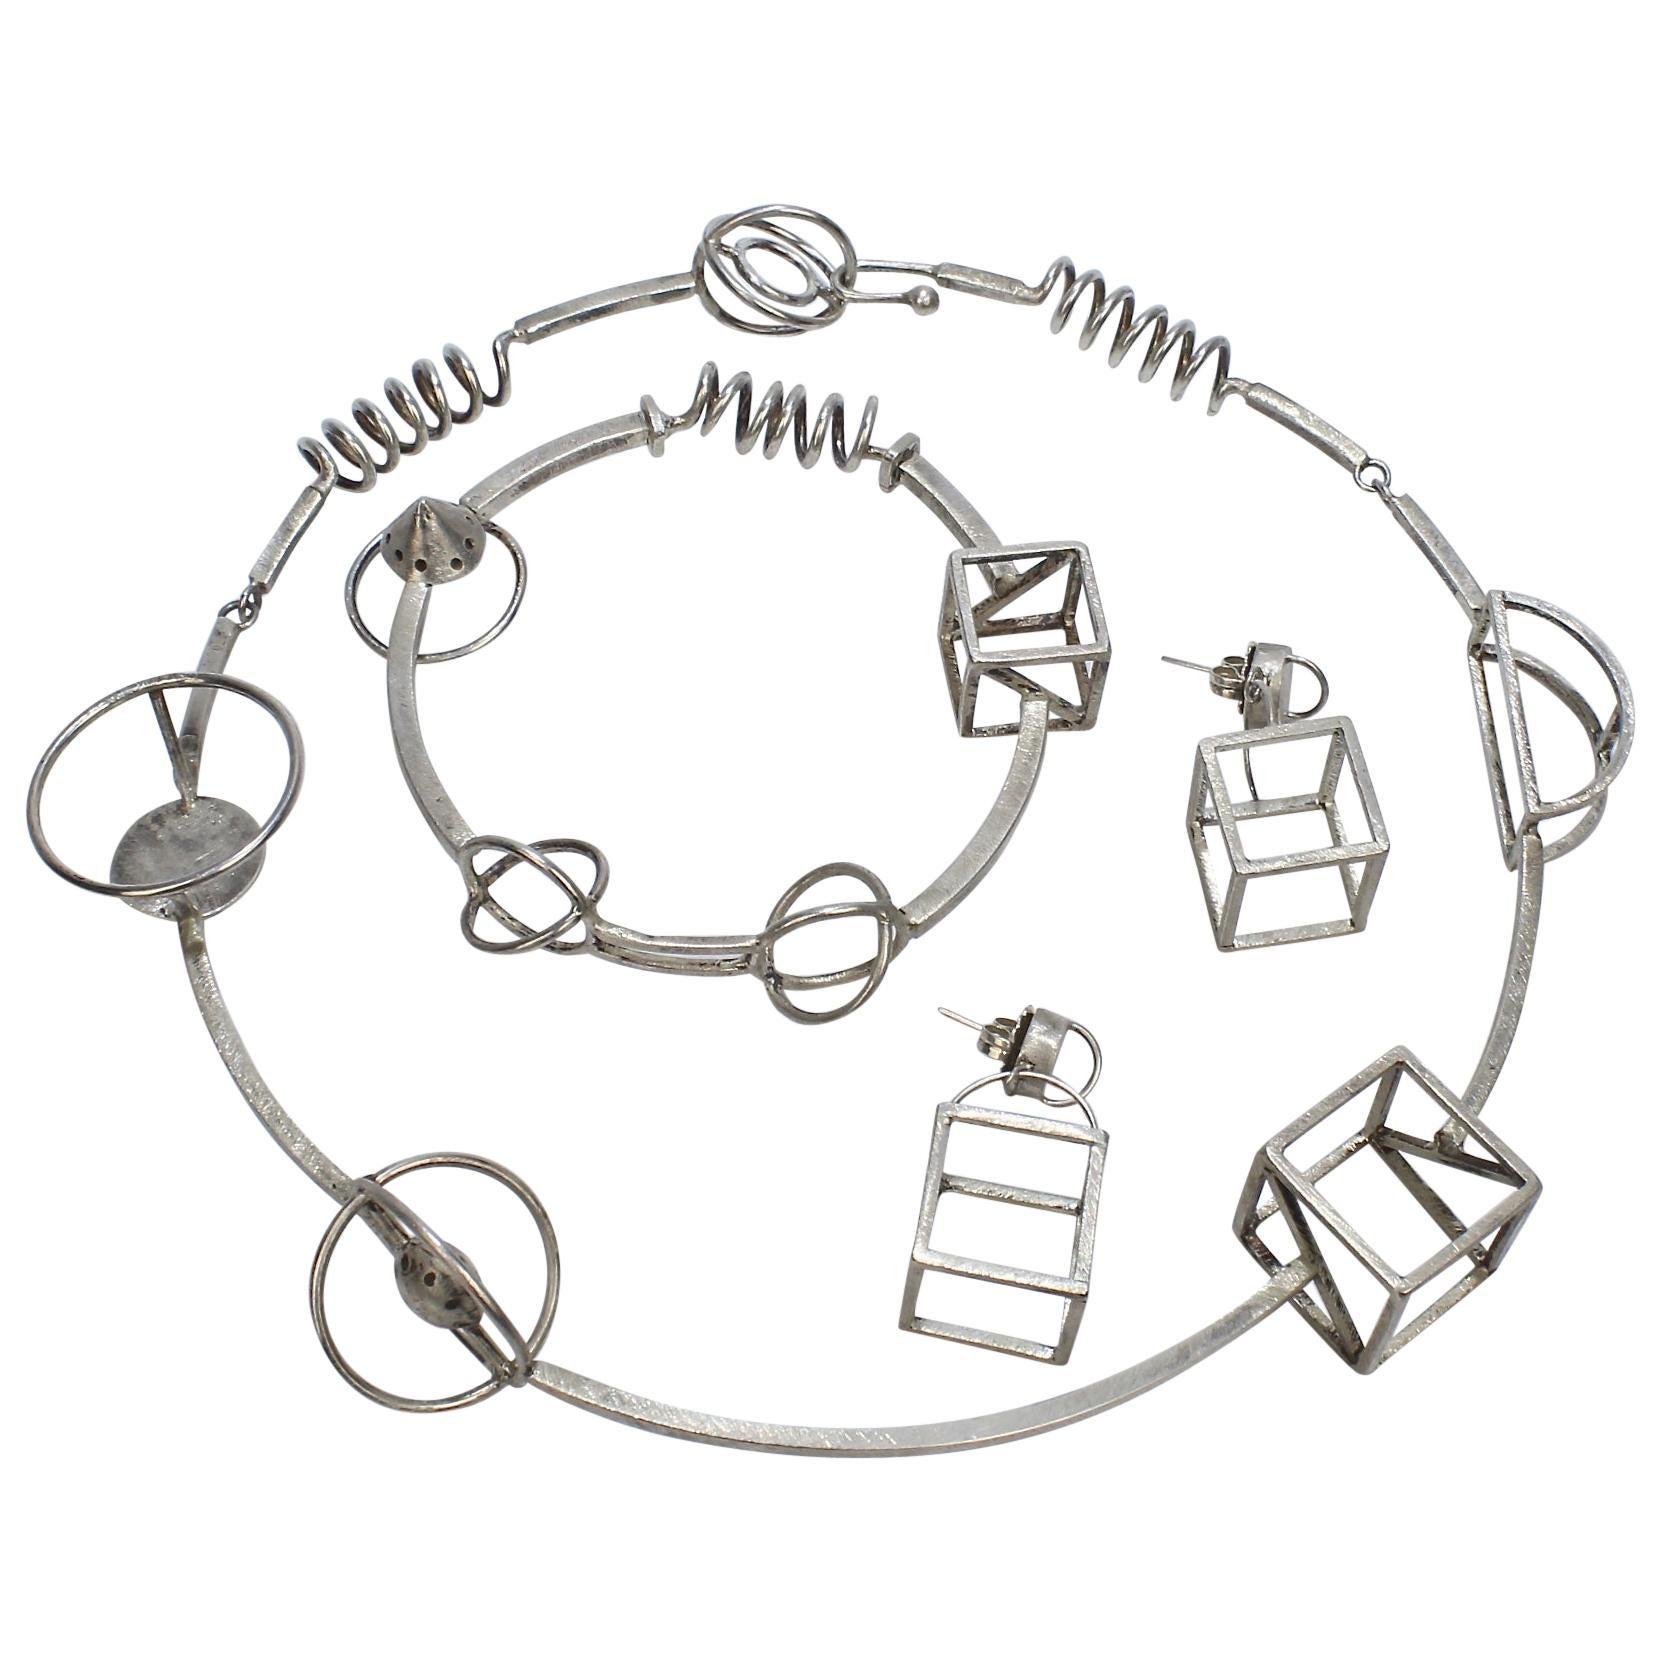 Retro Yumi Ueno Sterling Silver Geometric Necklace, Earring, & Bracelet Parure